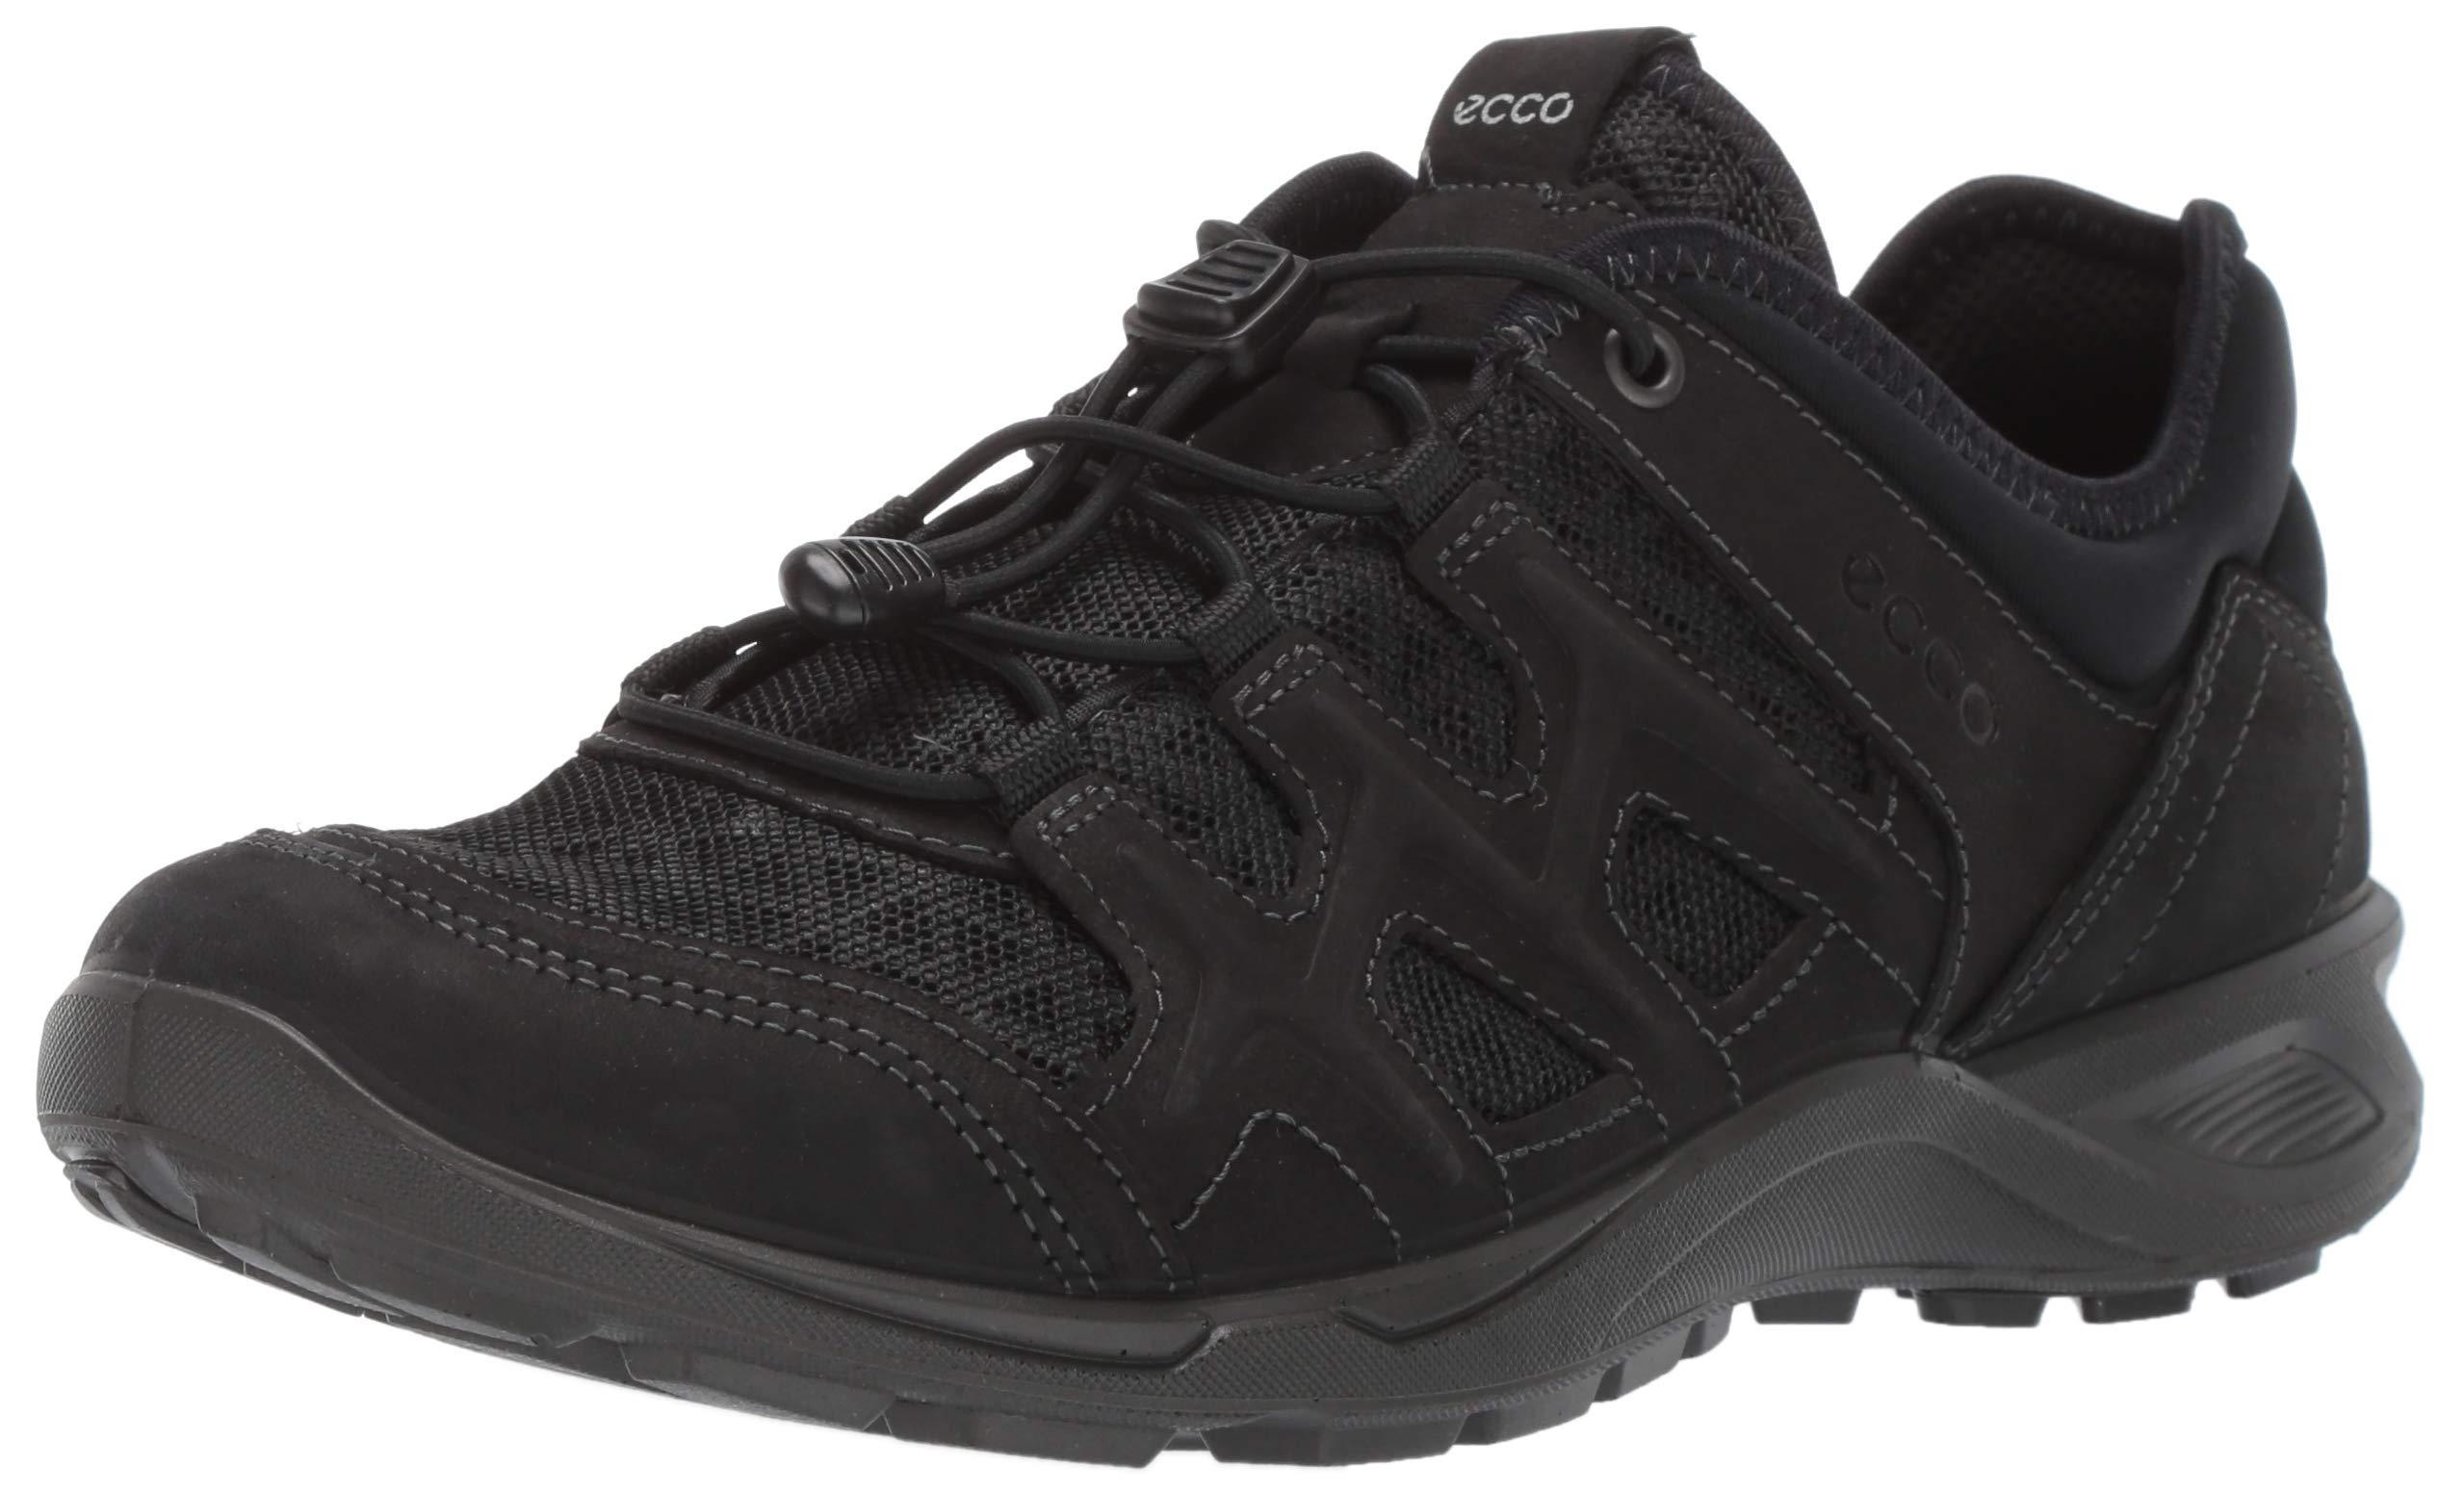 ECCO Terracruise Lite 男士徒步鞋